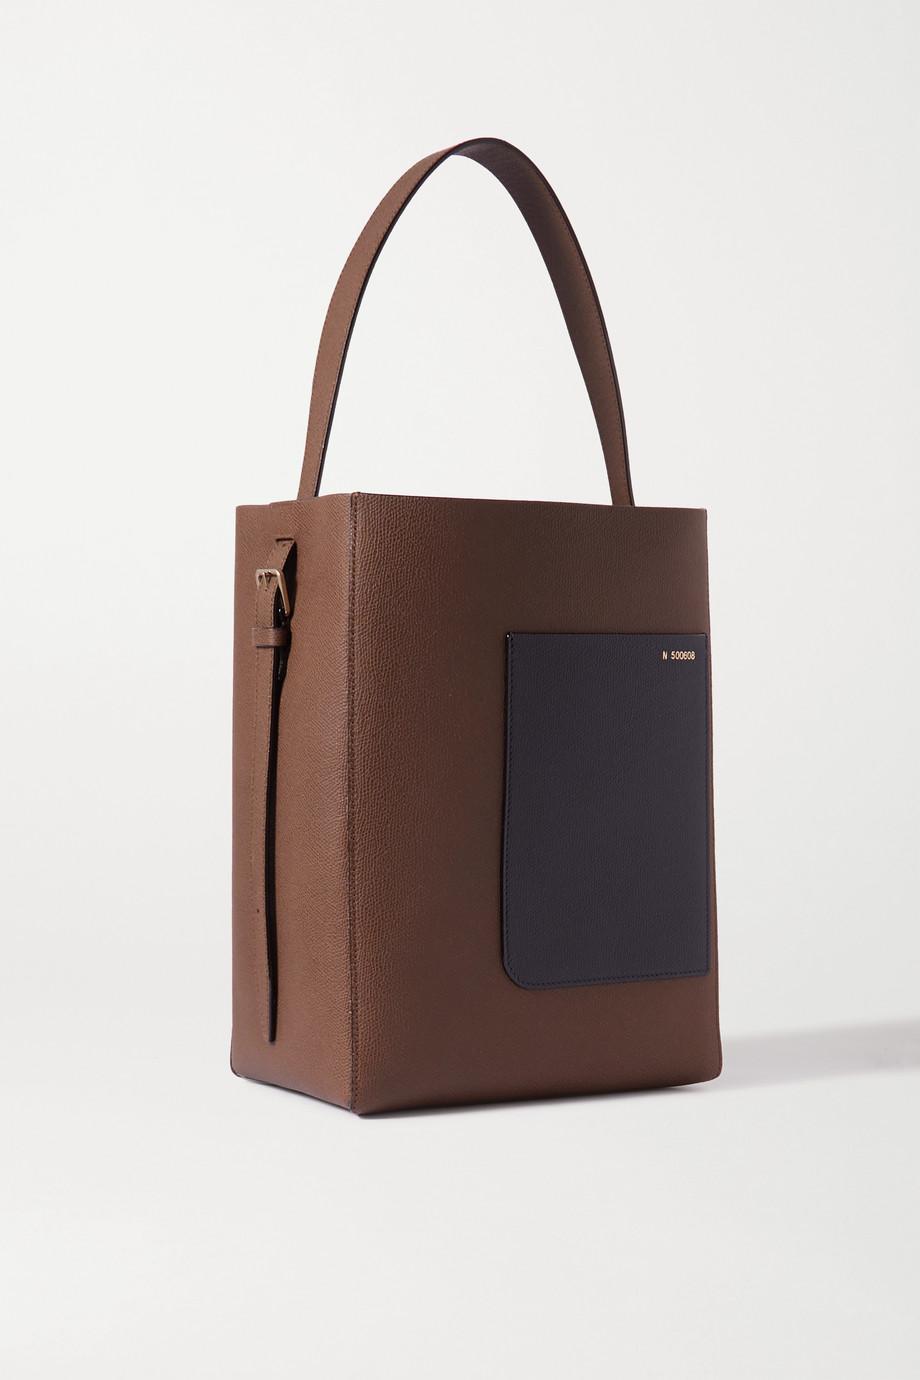 Valextra Secchiello two-tone textured-leather shoulder bag